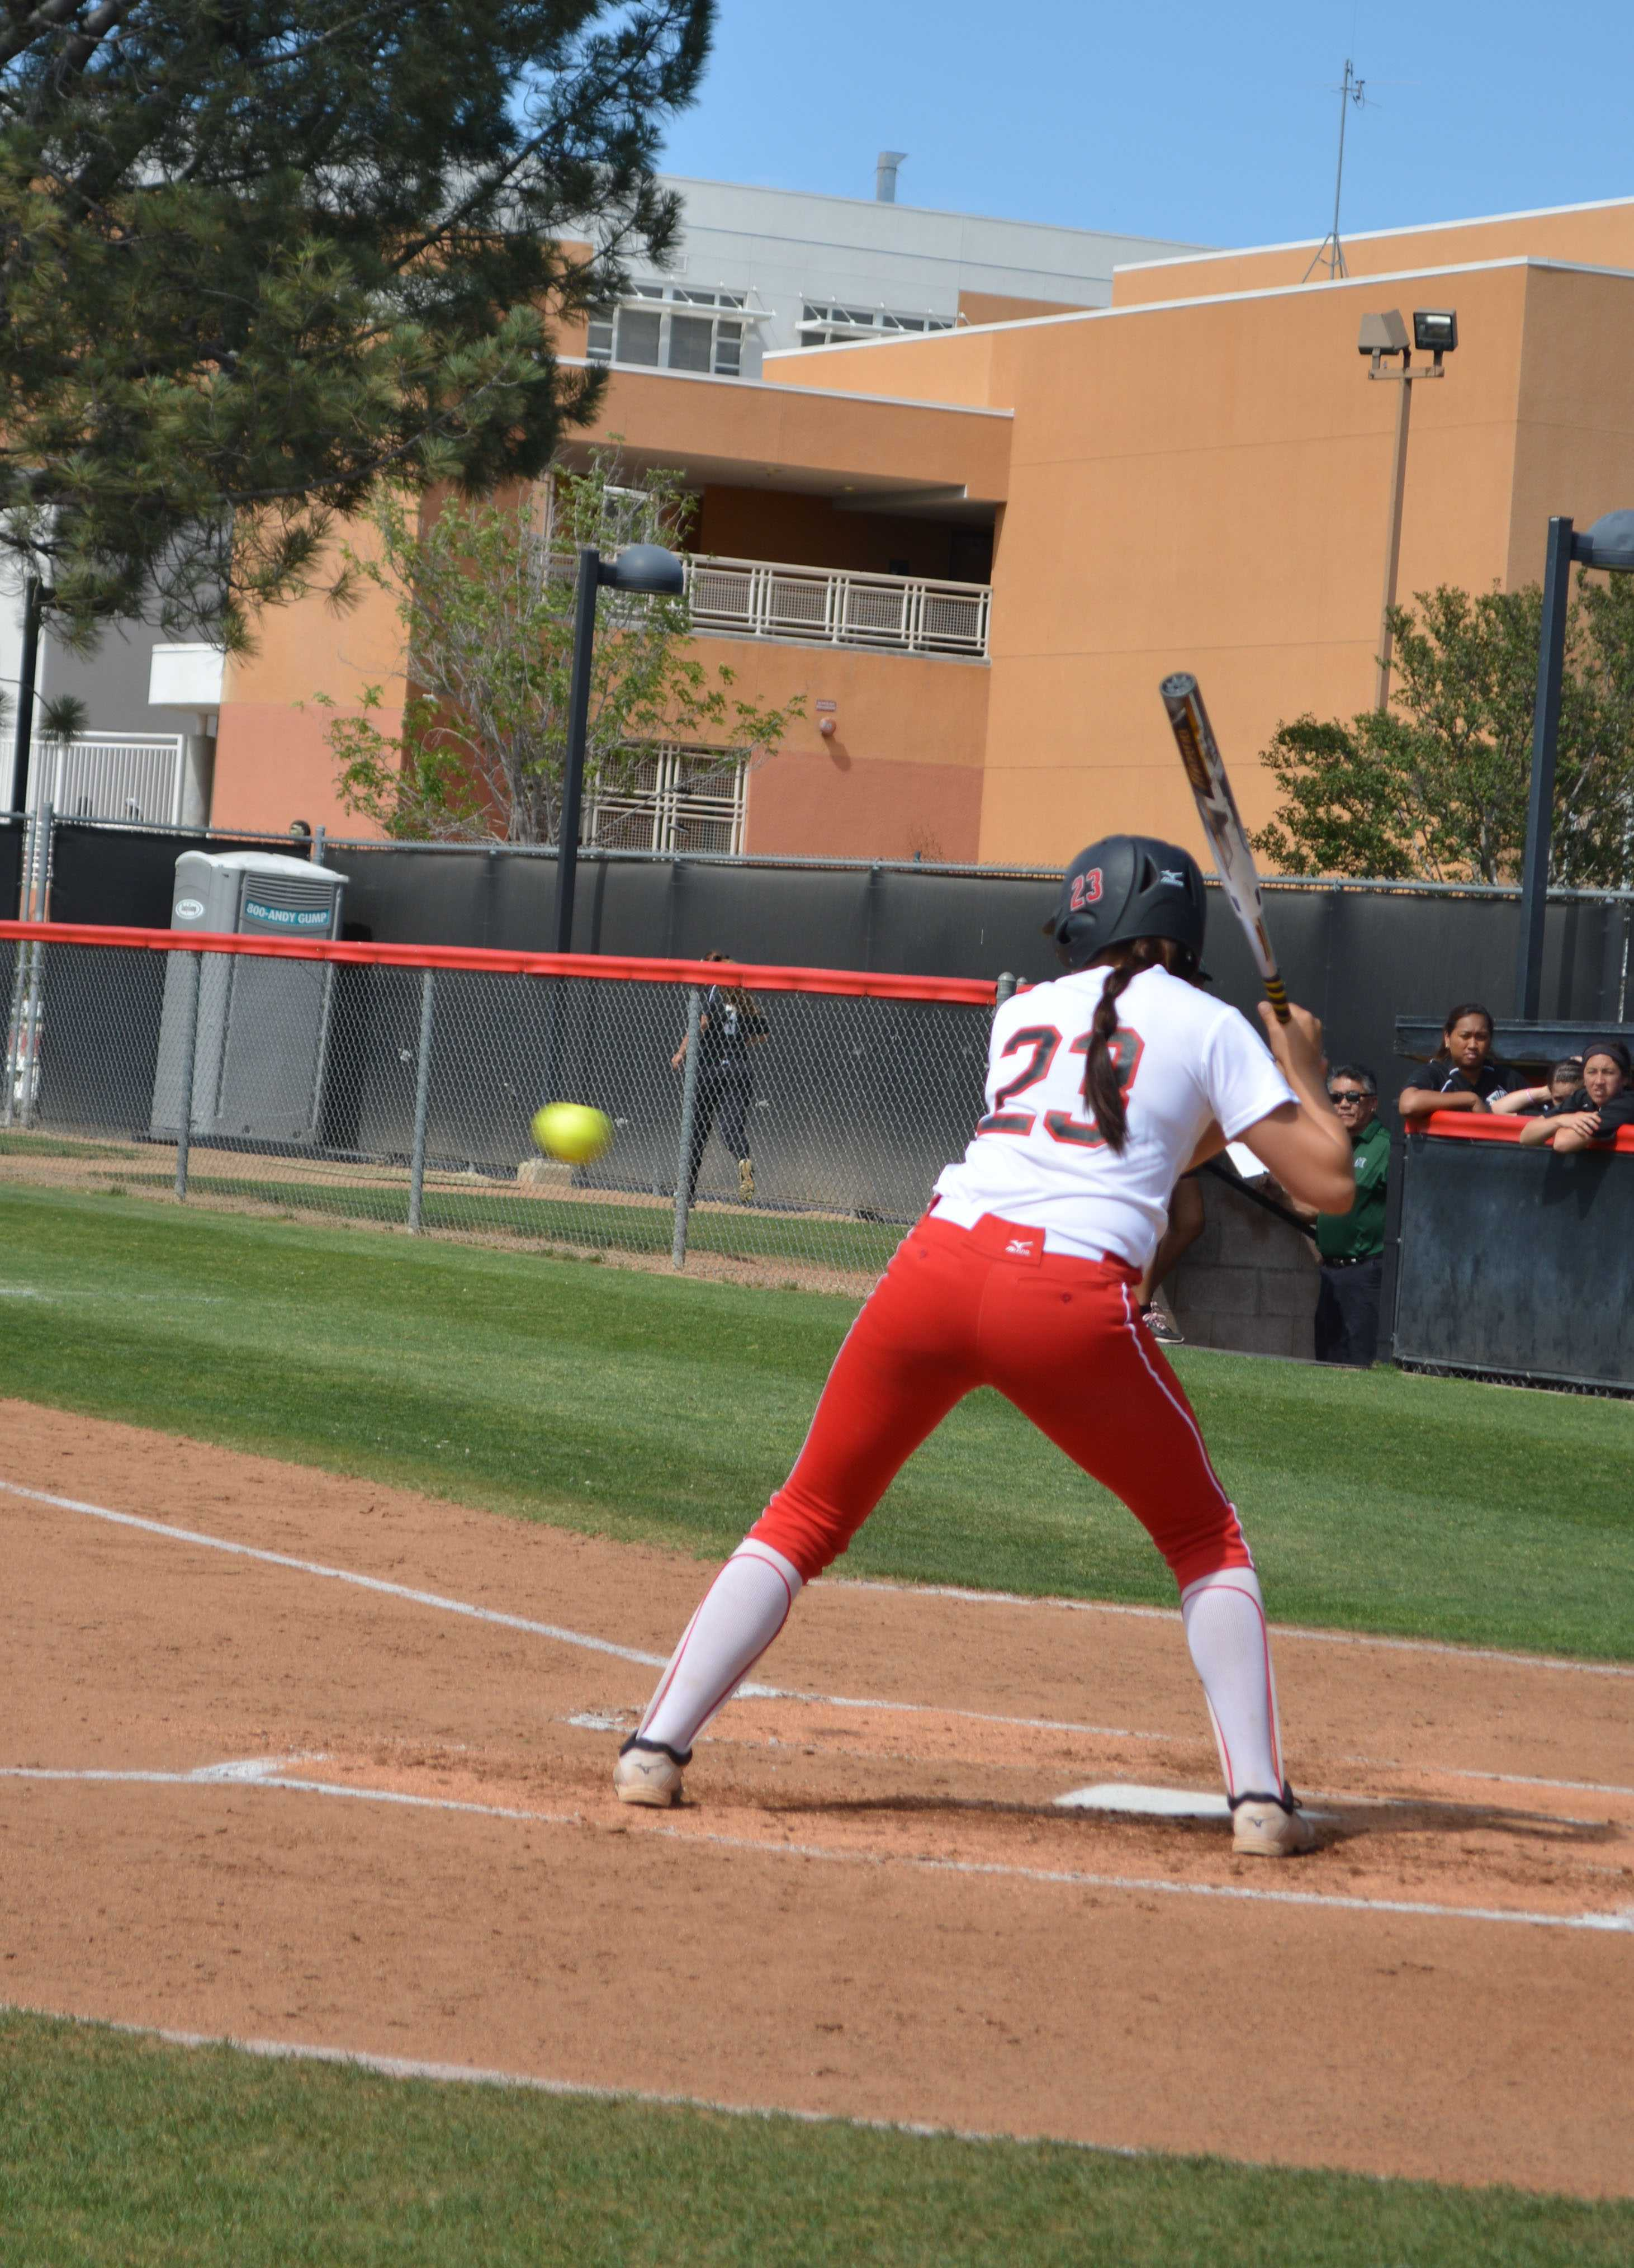 CSUN+Senior+Jordan+Sauceda+prepares+to+swing+at+an+oncoming+ball.+Emily+Pierce%2FContributor